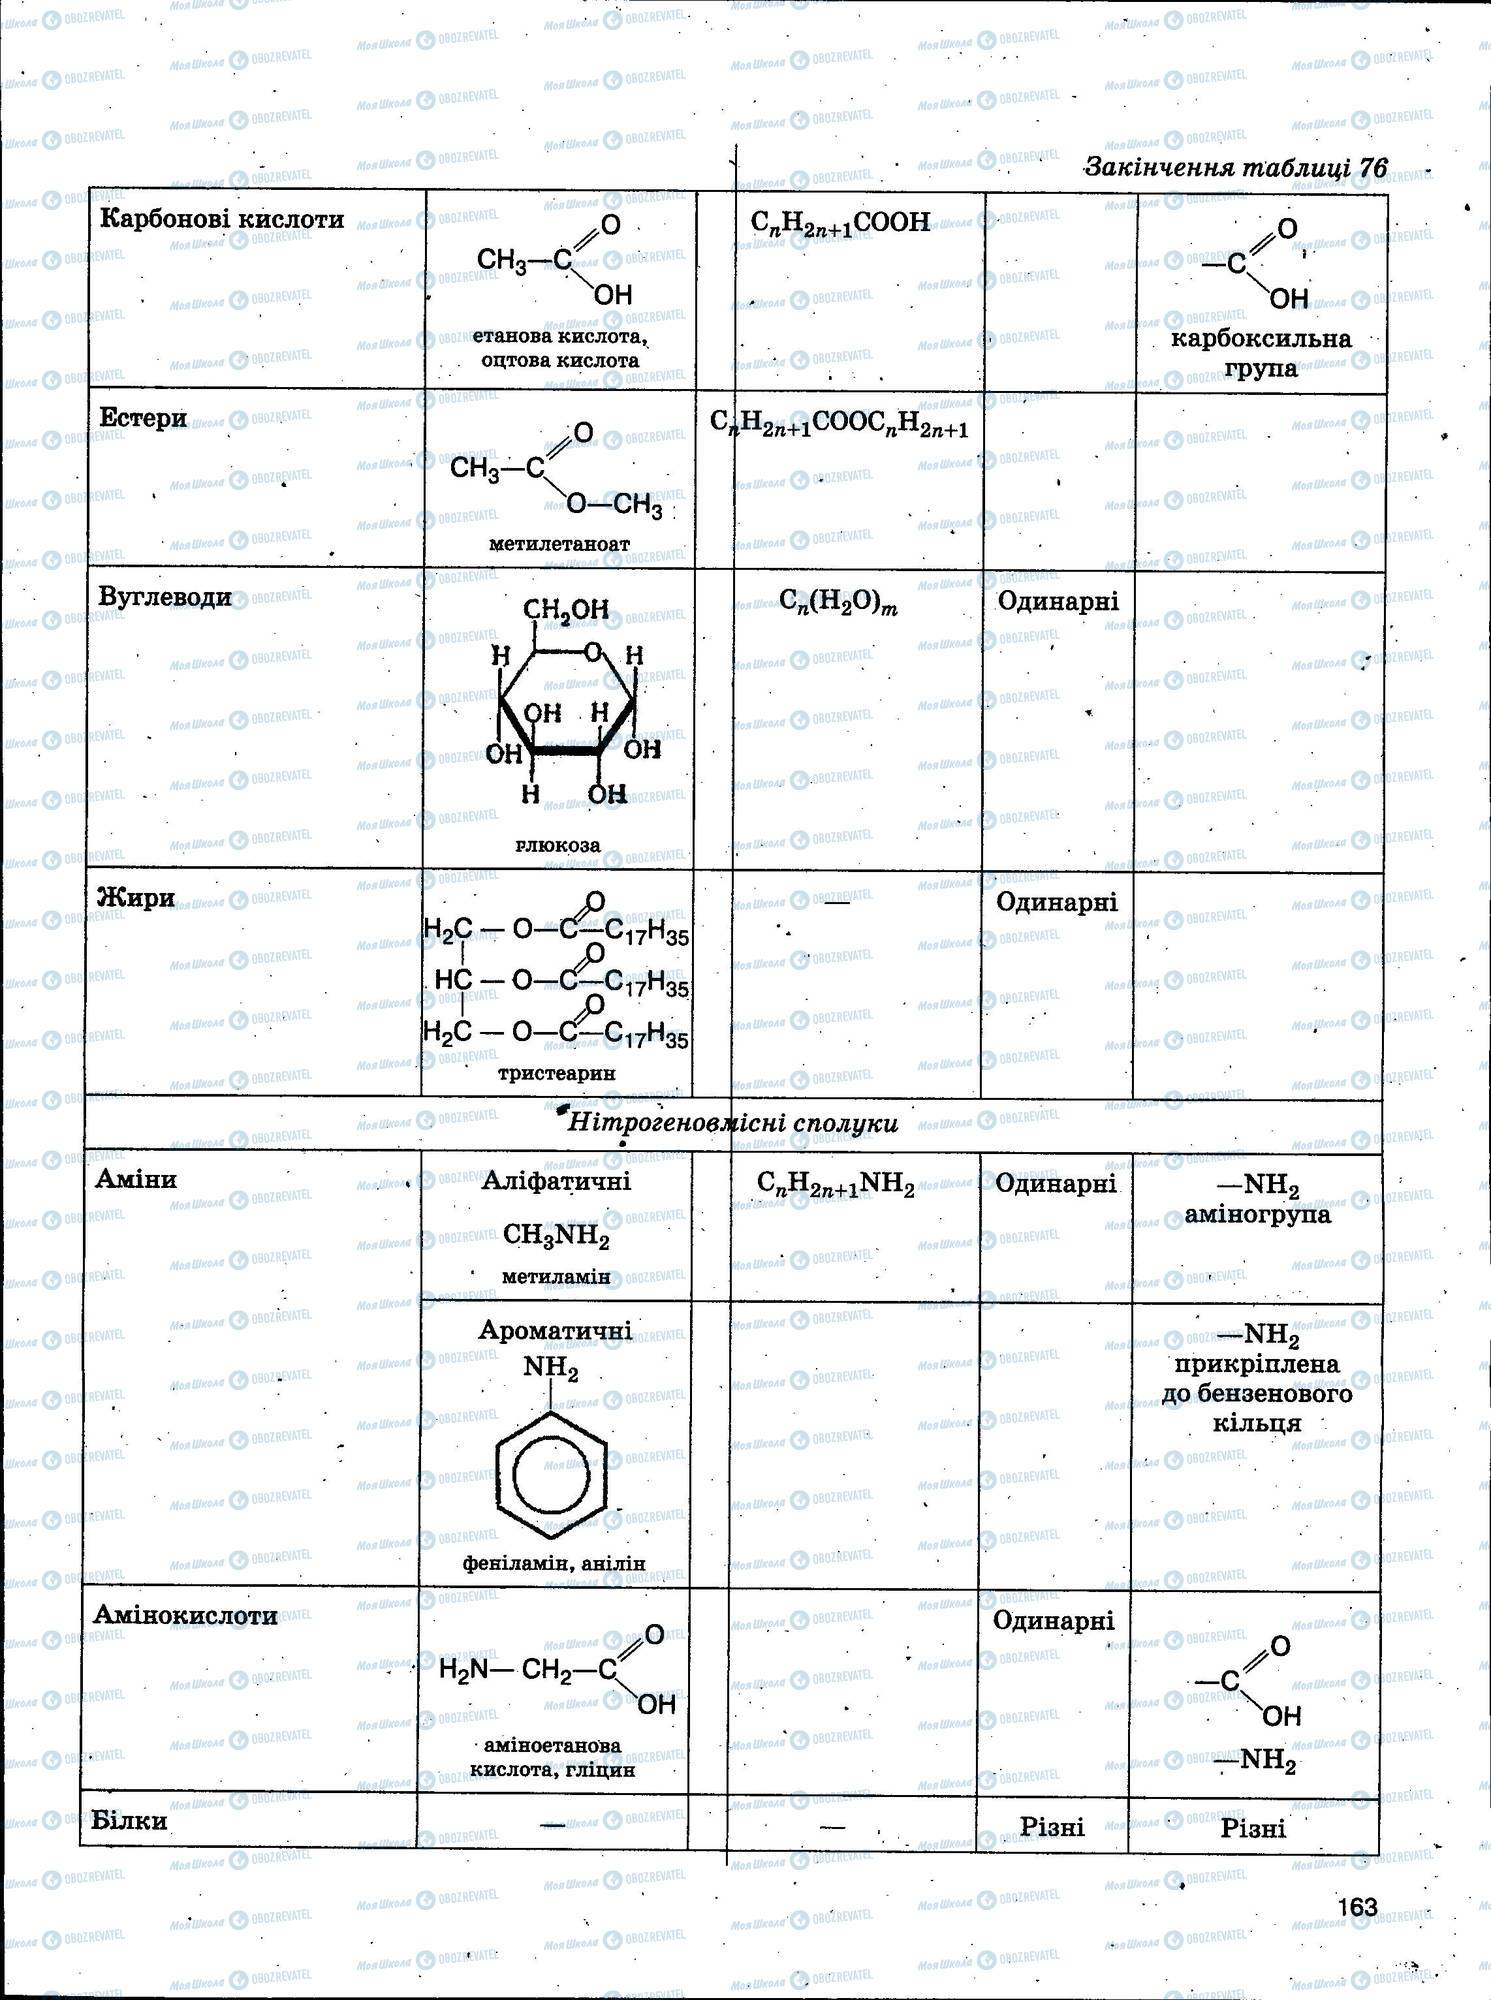 ЗНО Химия 11 класс страница 163